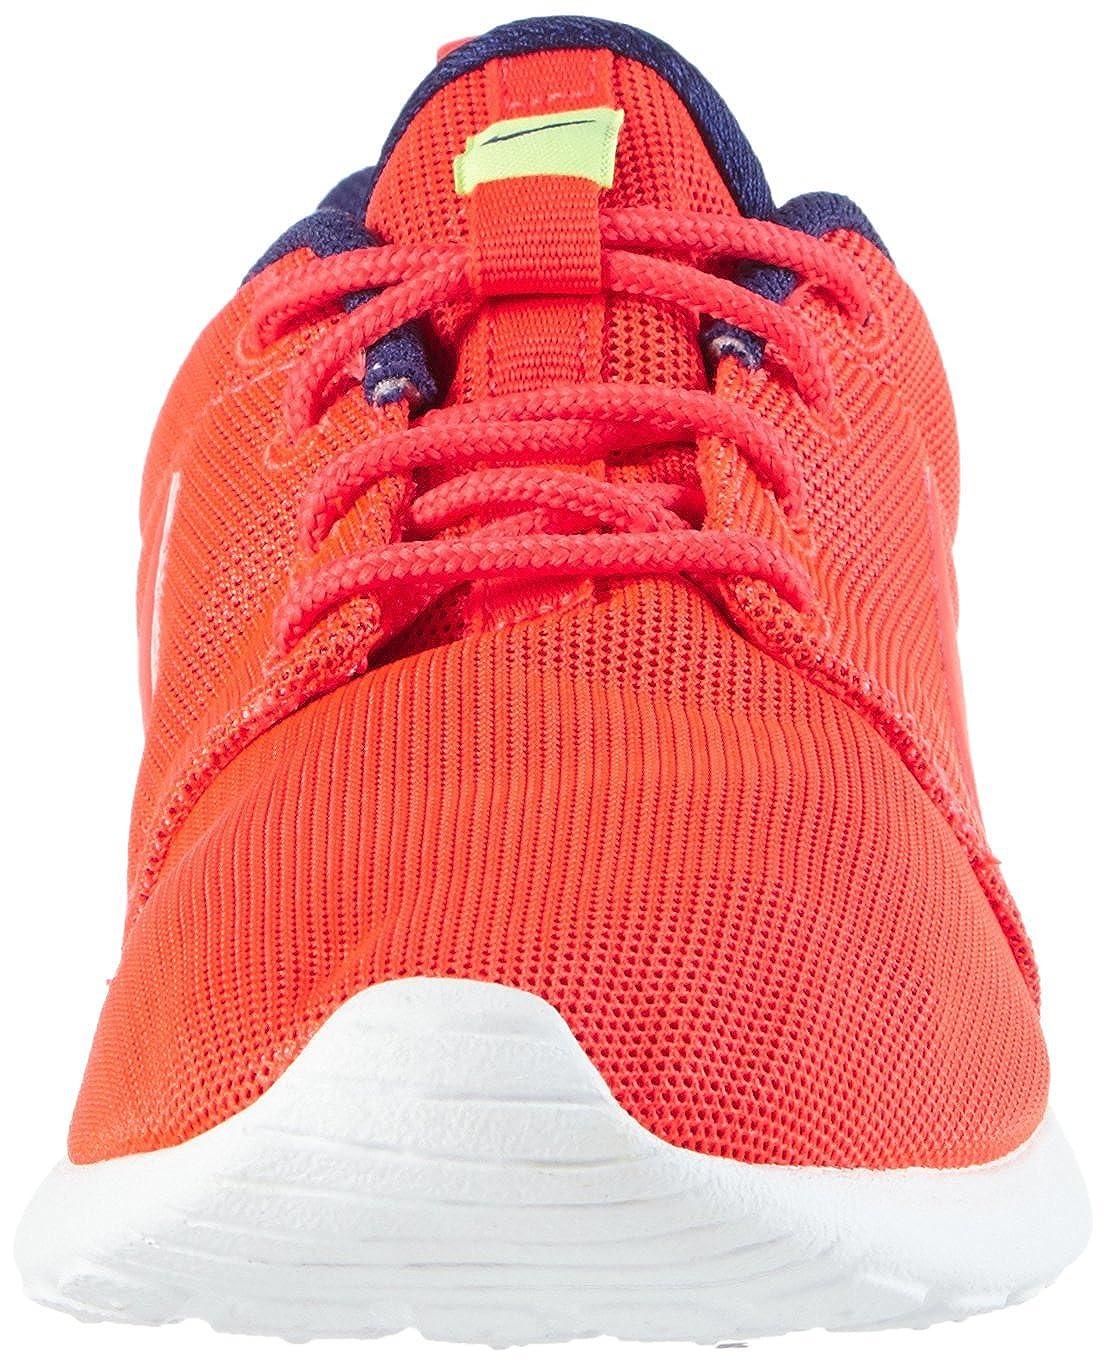 Nike Damen Roshe One Moire WMNS 819961 661 Laufschuhe  Amazon  ... Auktion